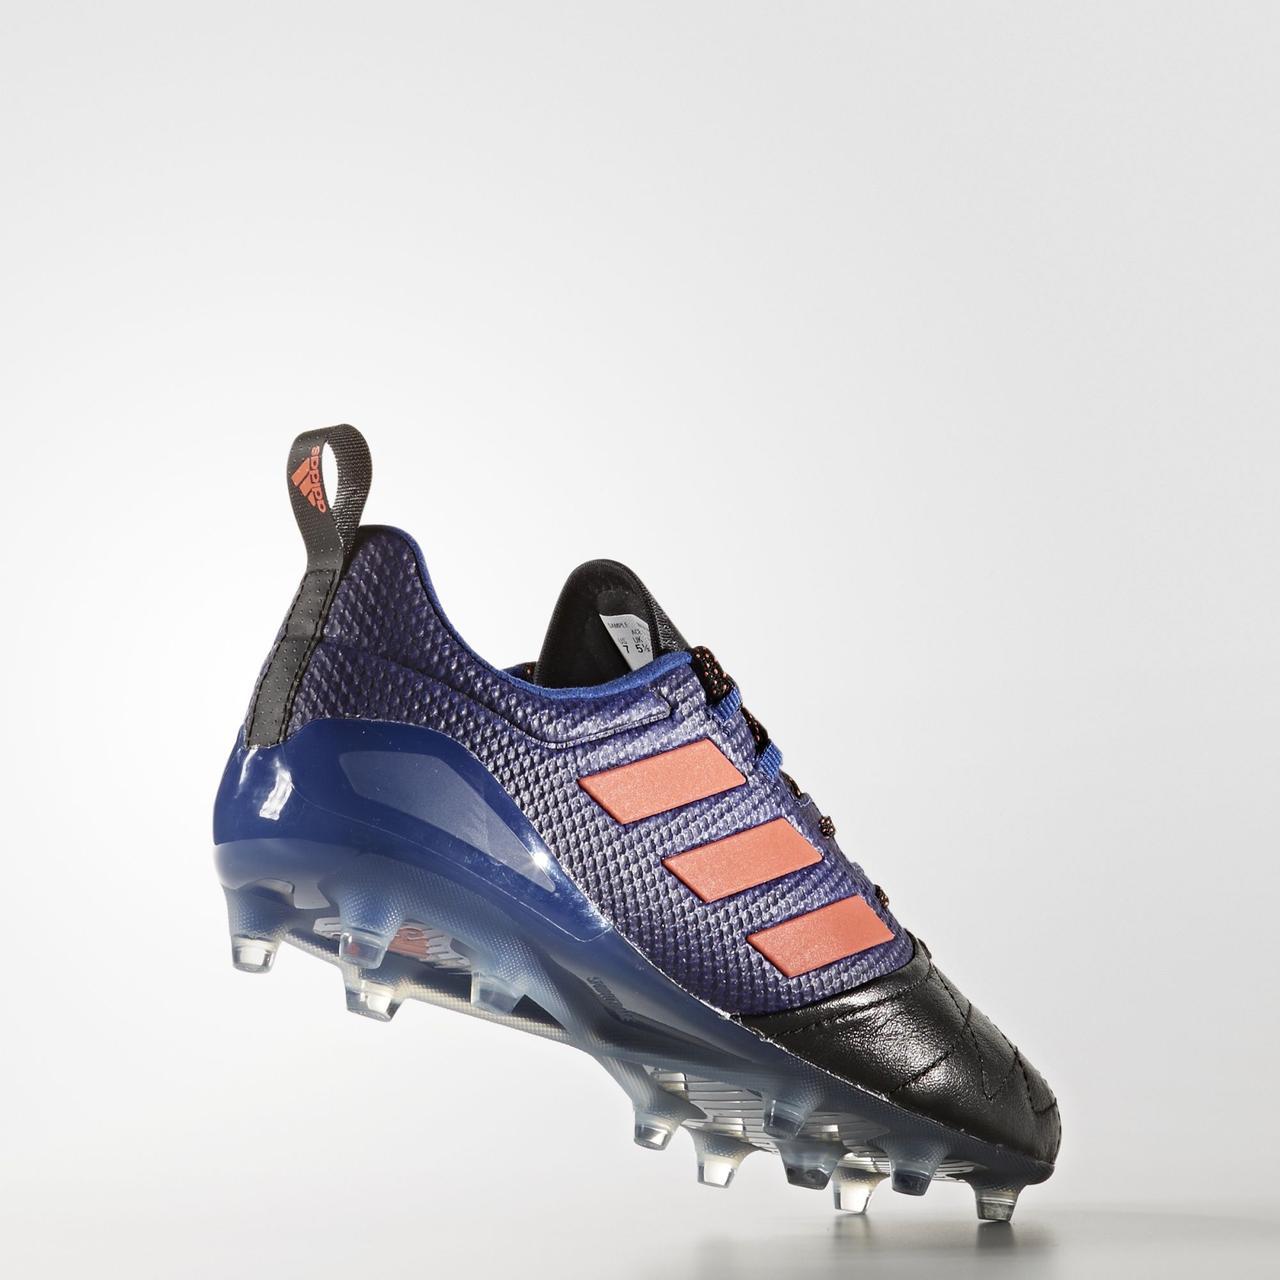 ... Женские футбольные бутсы Adidas Perofrmance Ace 17.1 FG AG (Артикул   S77044), ... 37137a7abfb